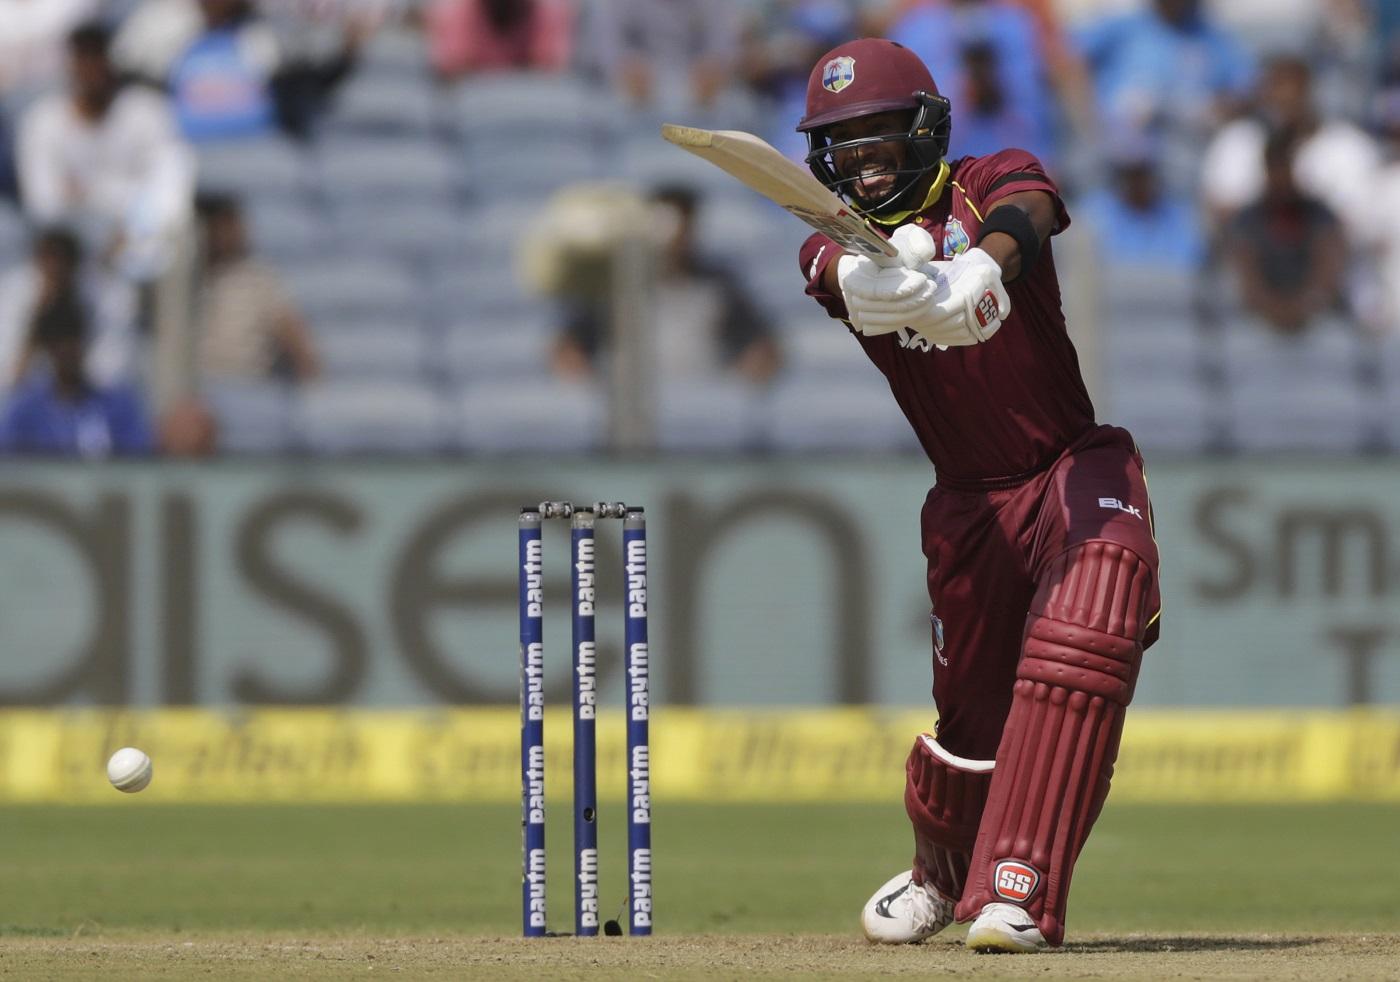 Full Scorecard Of India Vs West Indies 3rd Odi 2018 Score